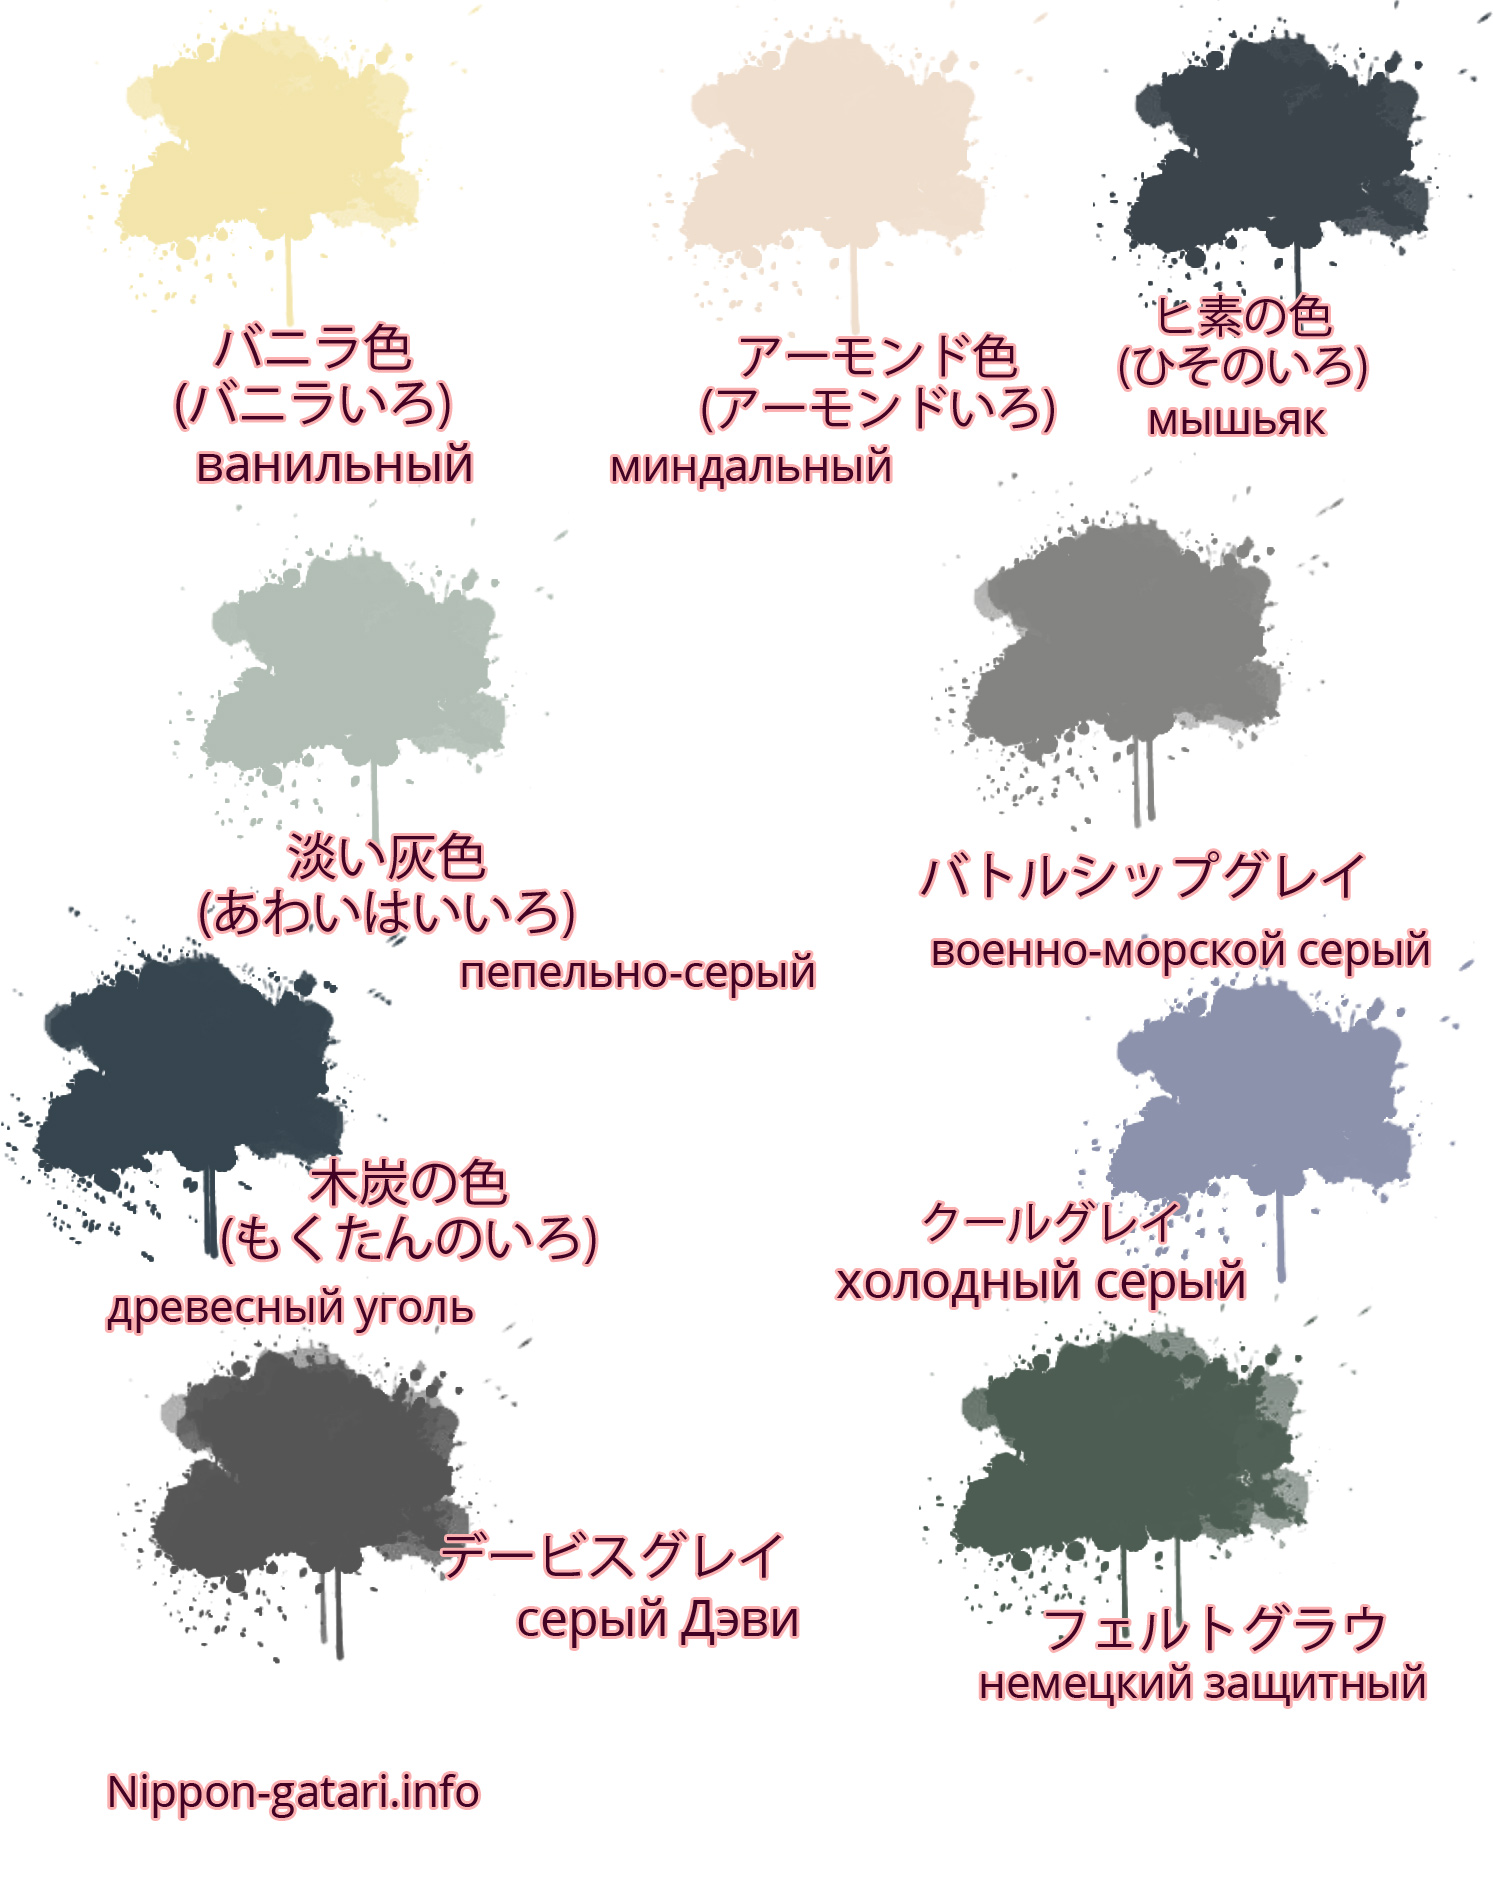 Цвета на японском